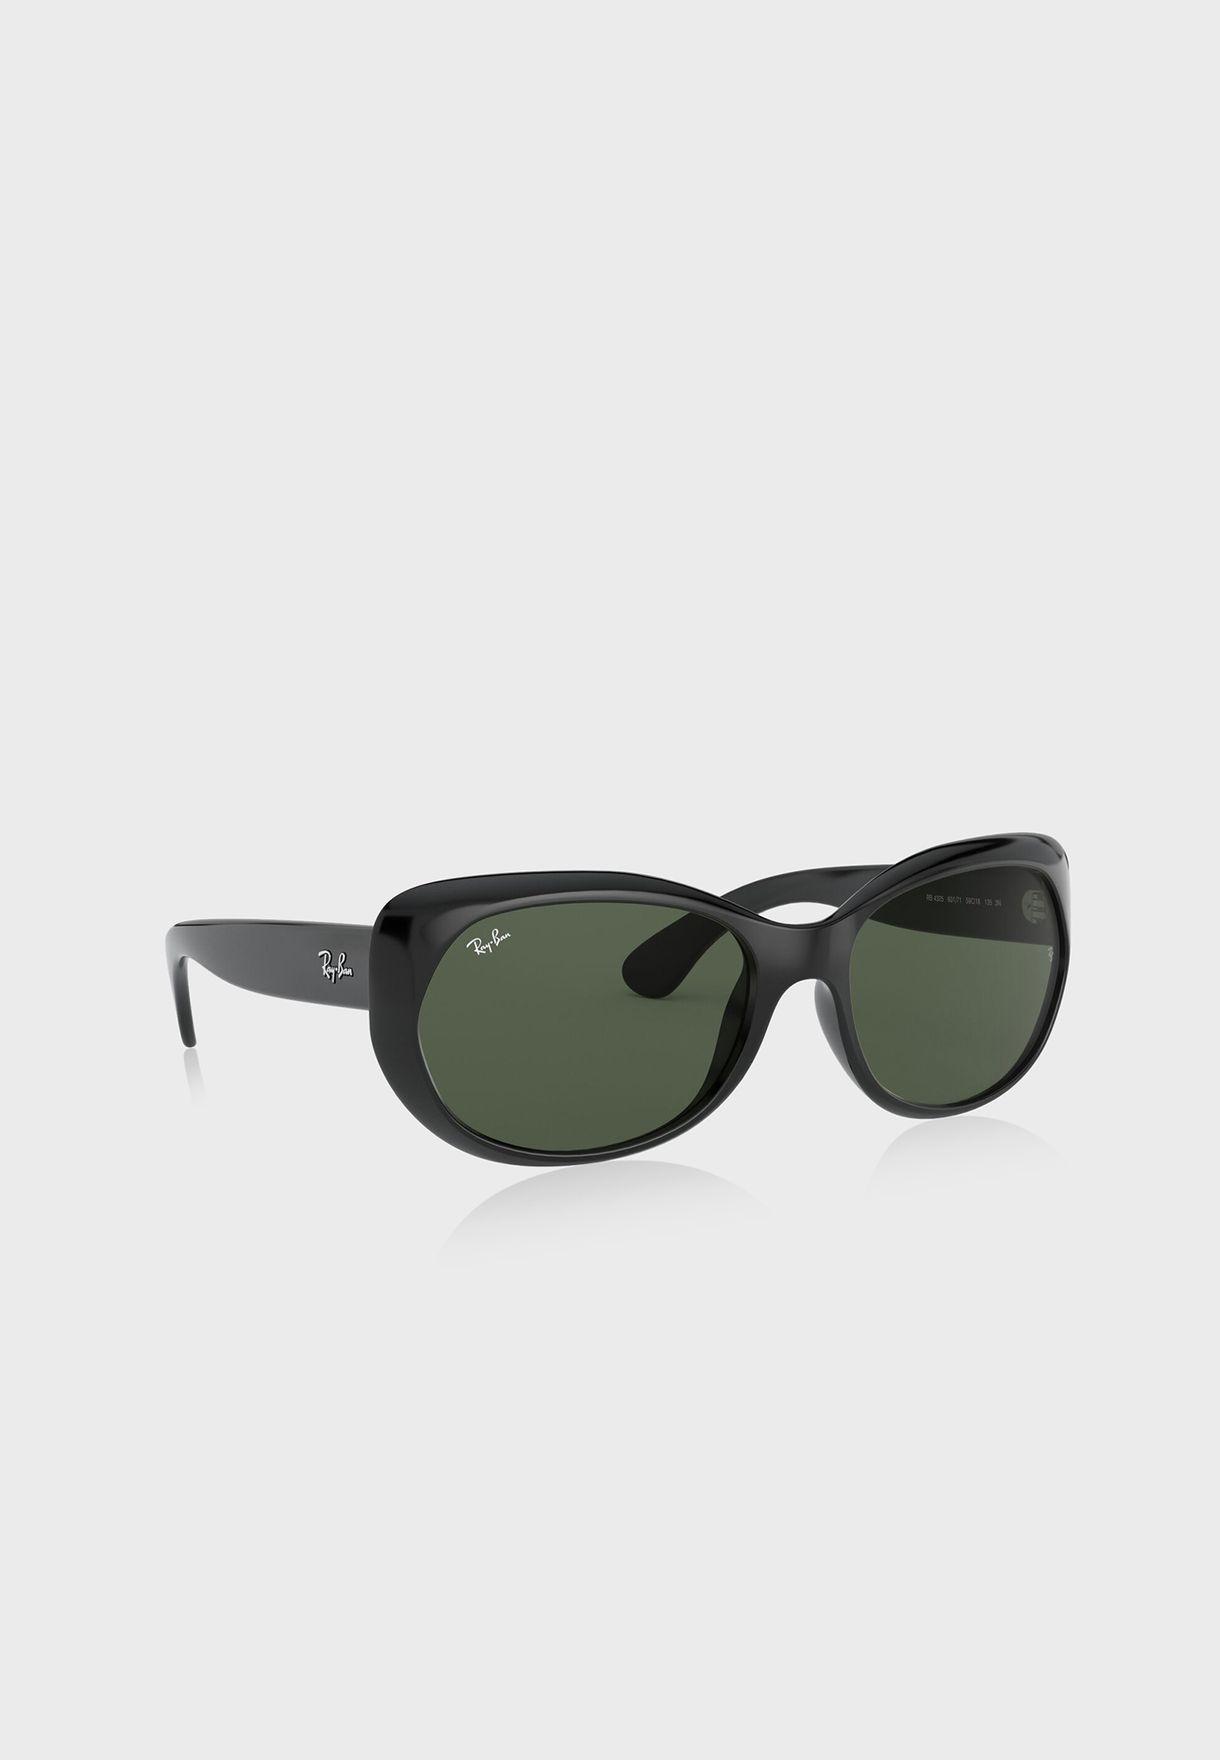 0Rb4325 Oversized Sunglasses